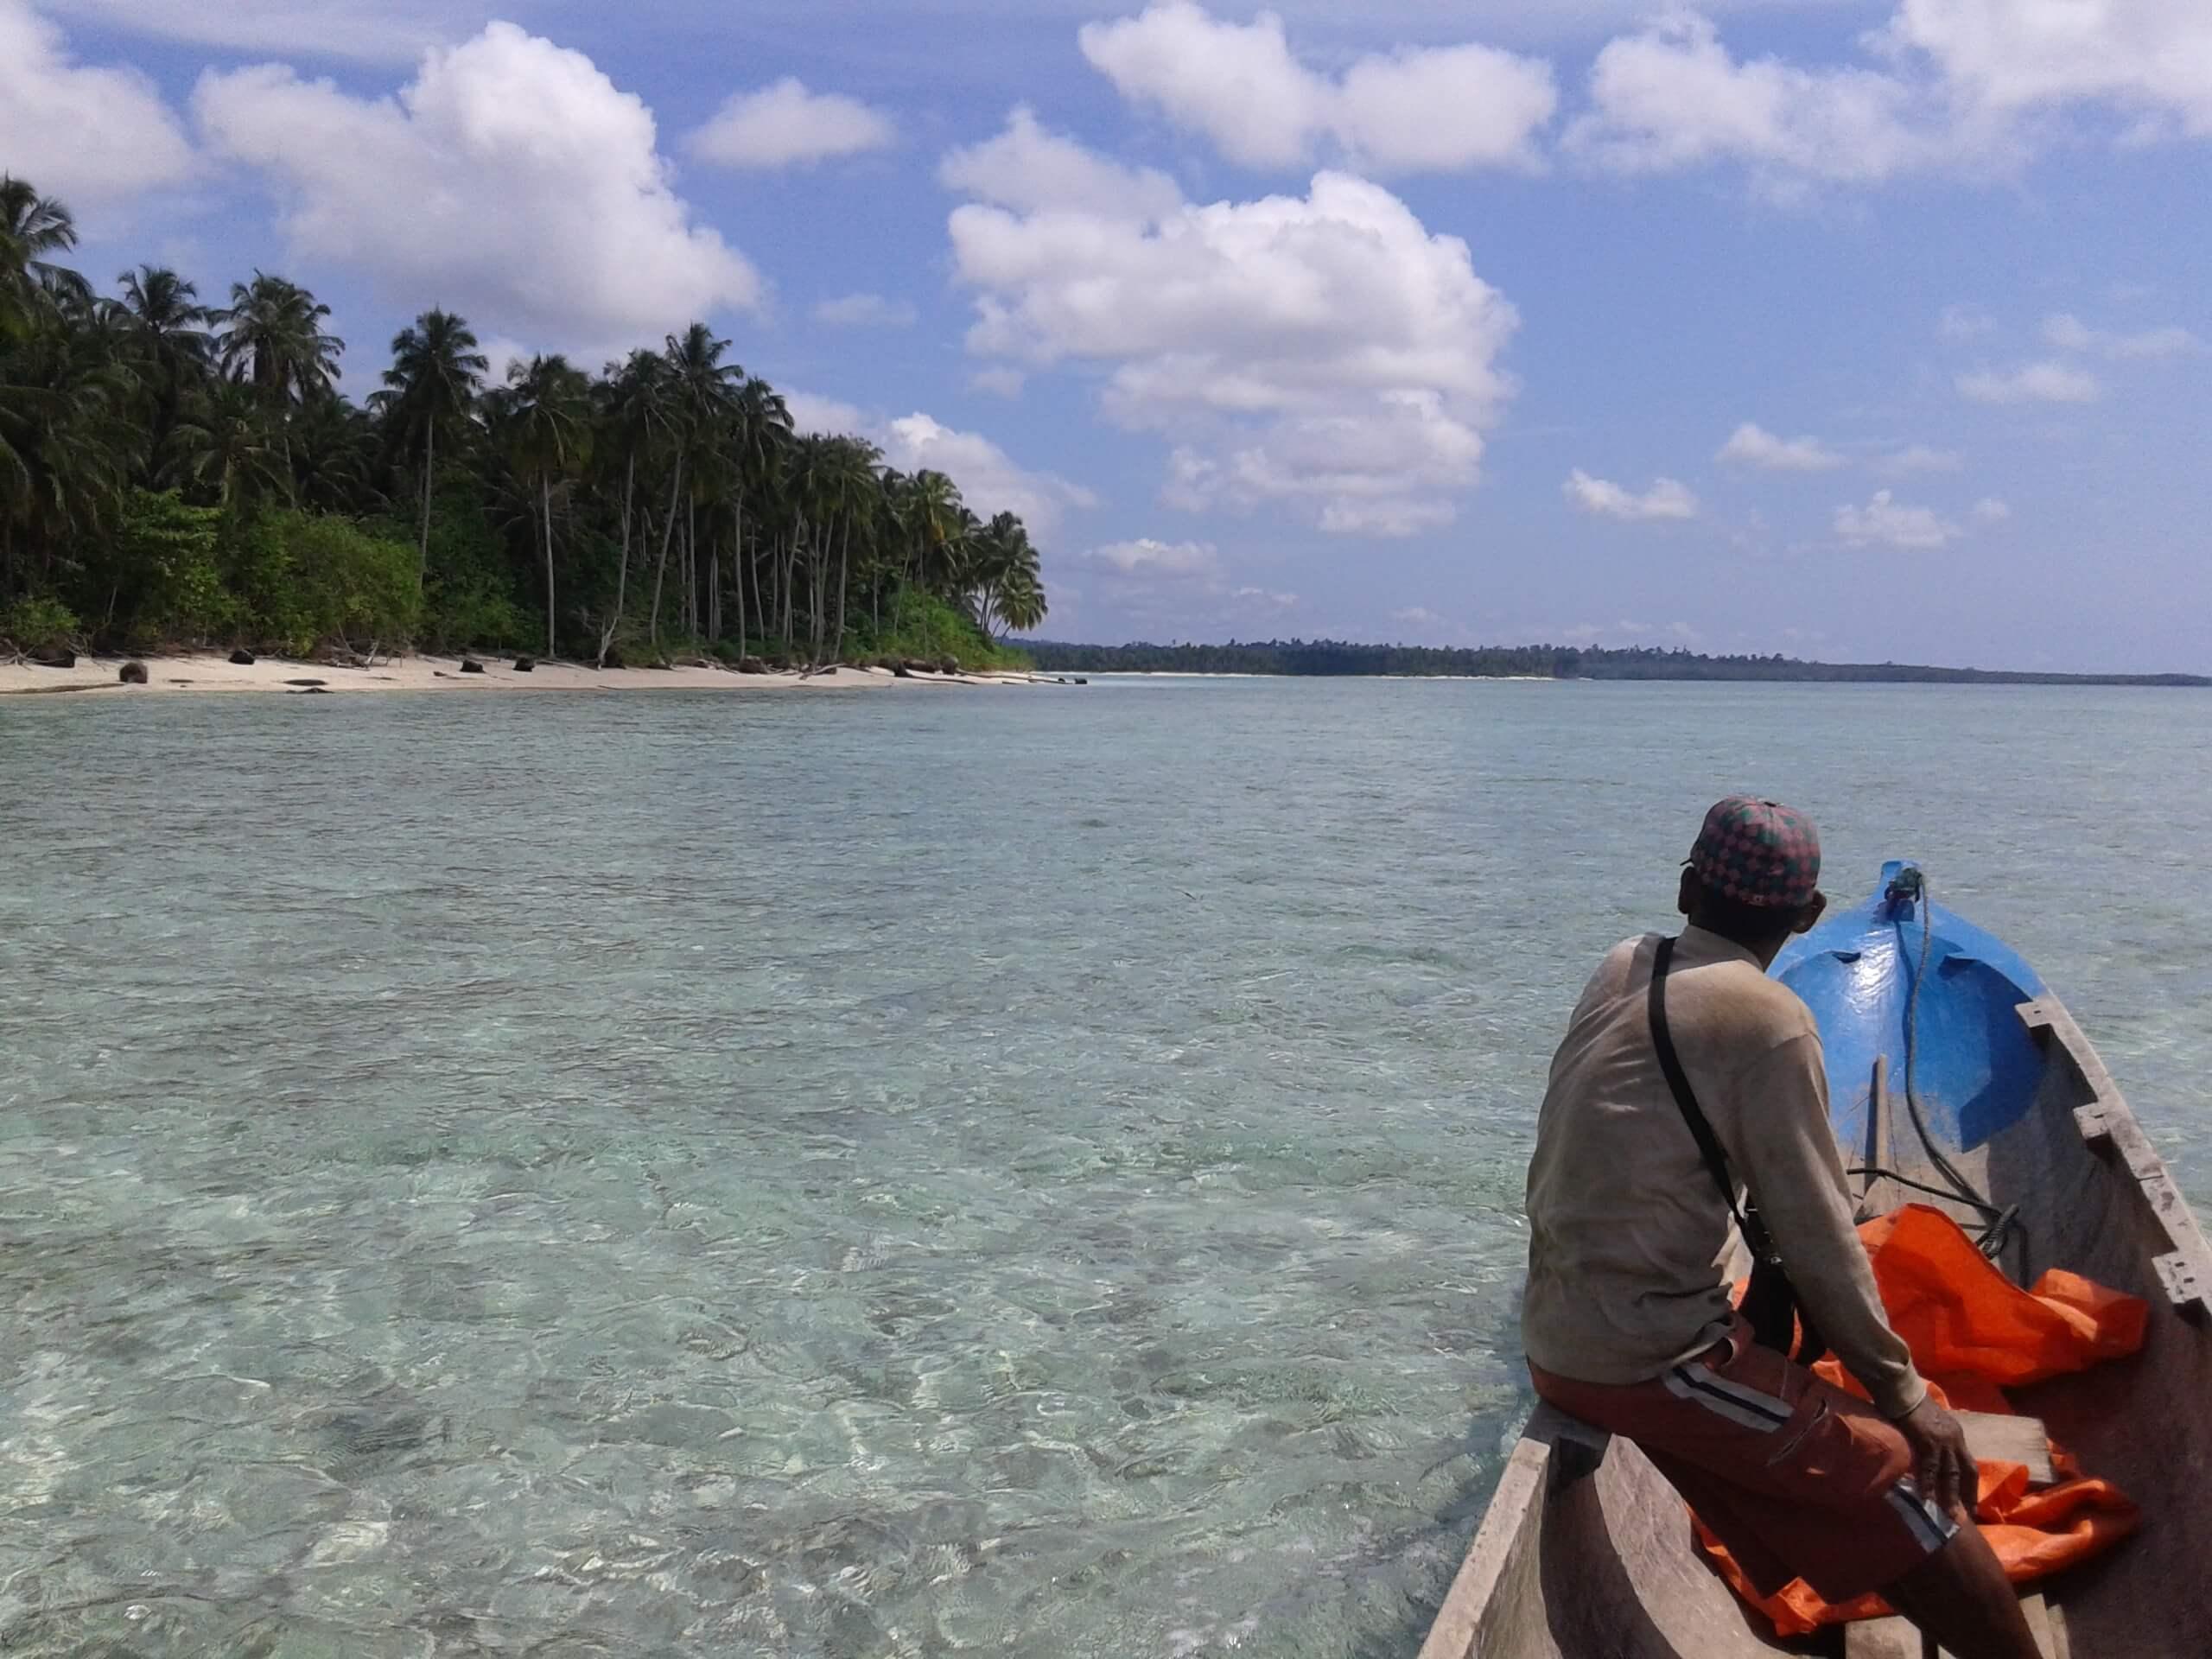 Trajet en pirogue dans les îles mentawai